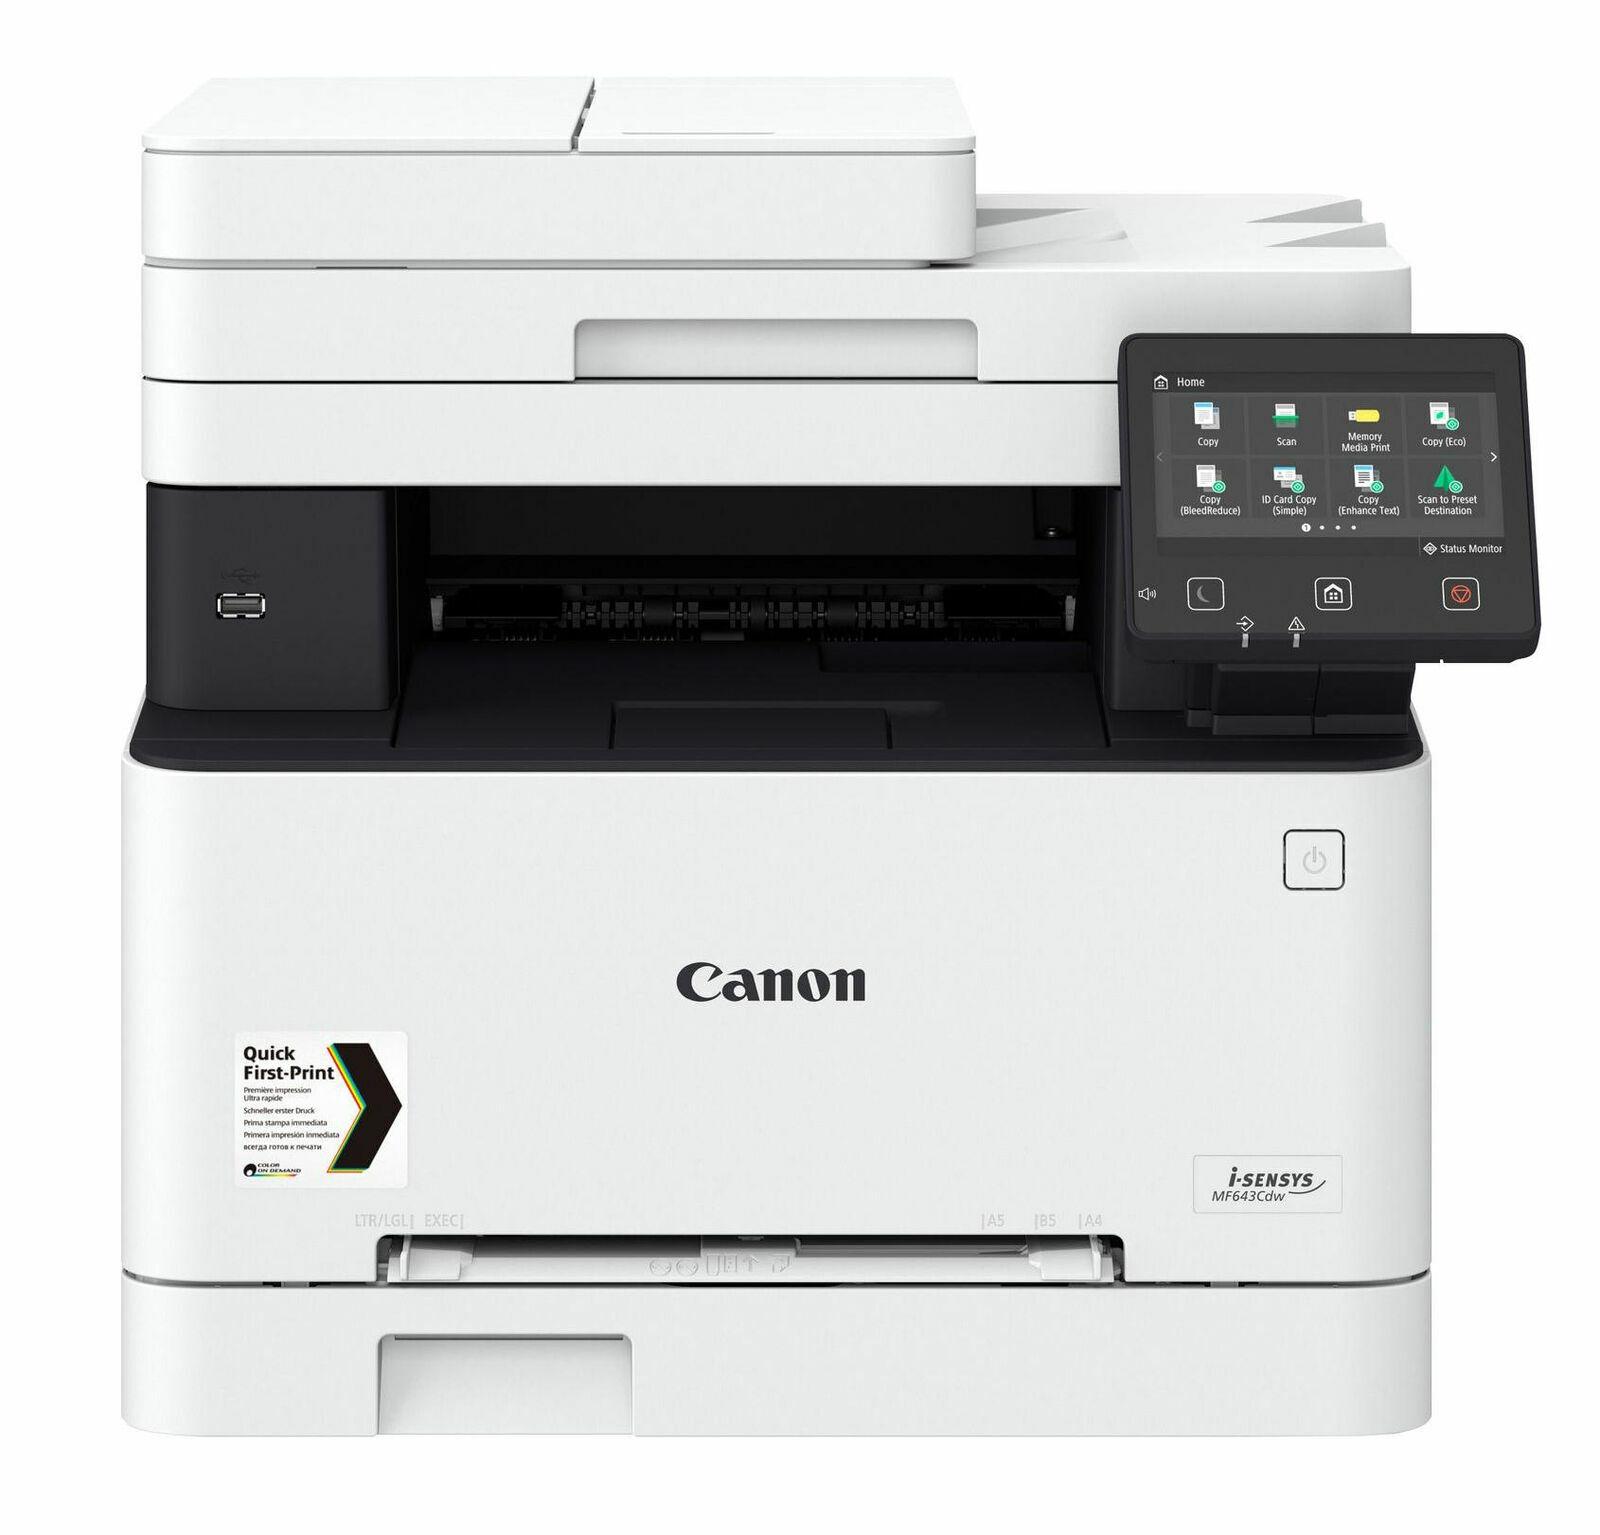 Canon i SENSYS MF20Cdw multifunktionaler Laserdrucker online ...